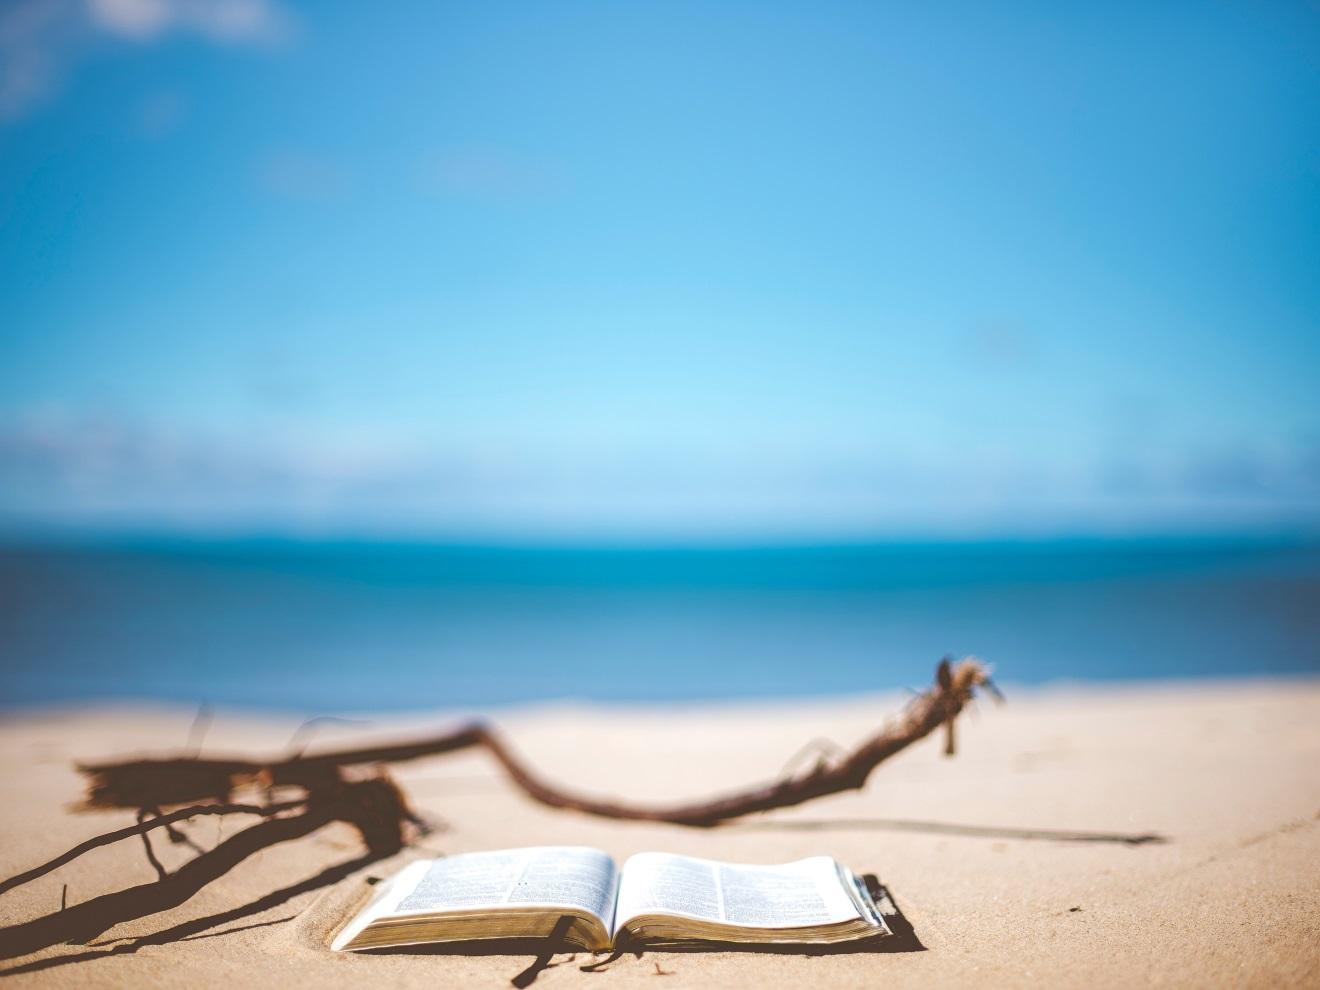 5 Summer Books From Bill Gates